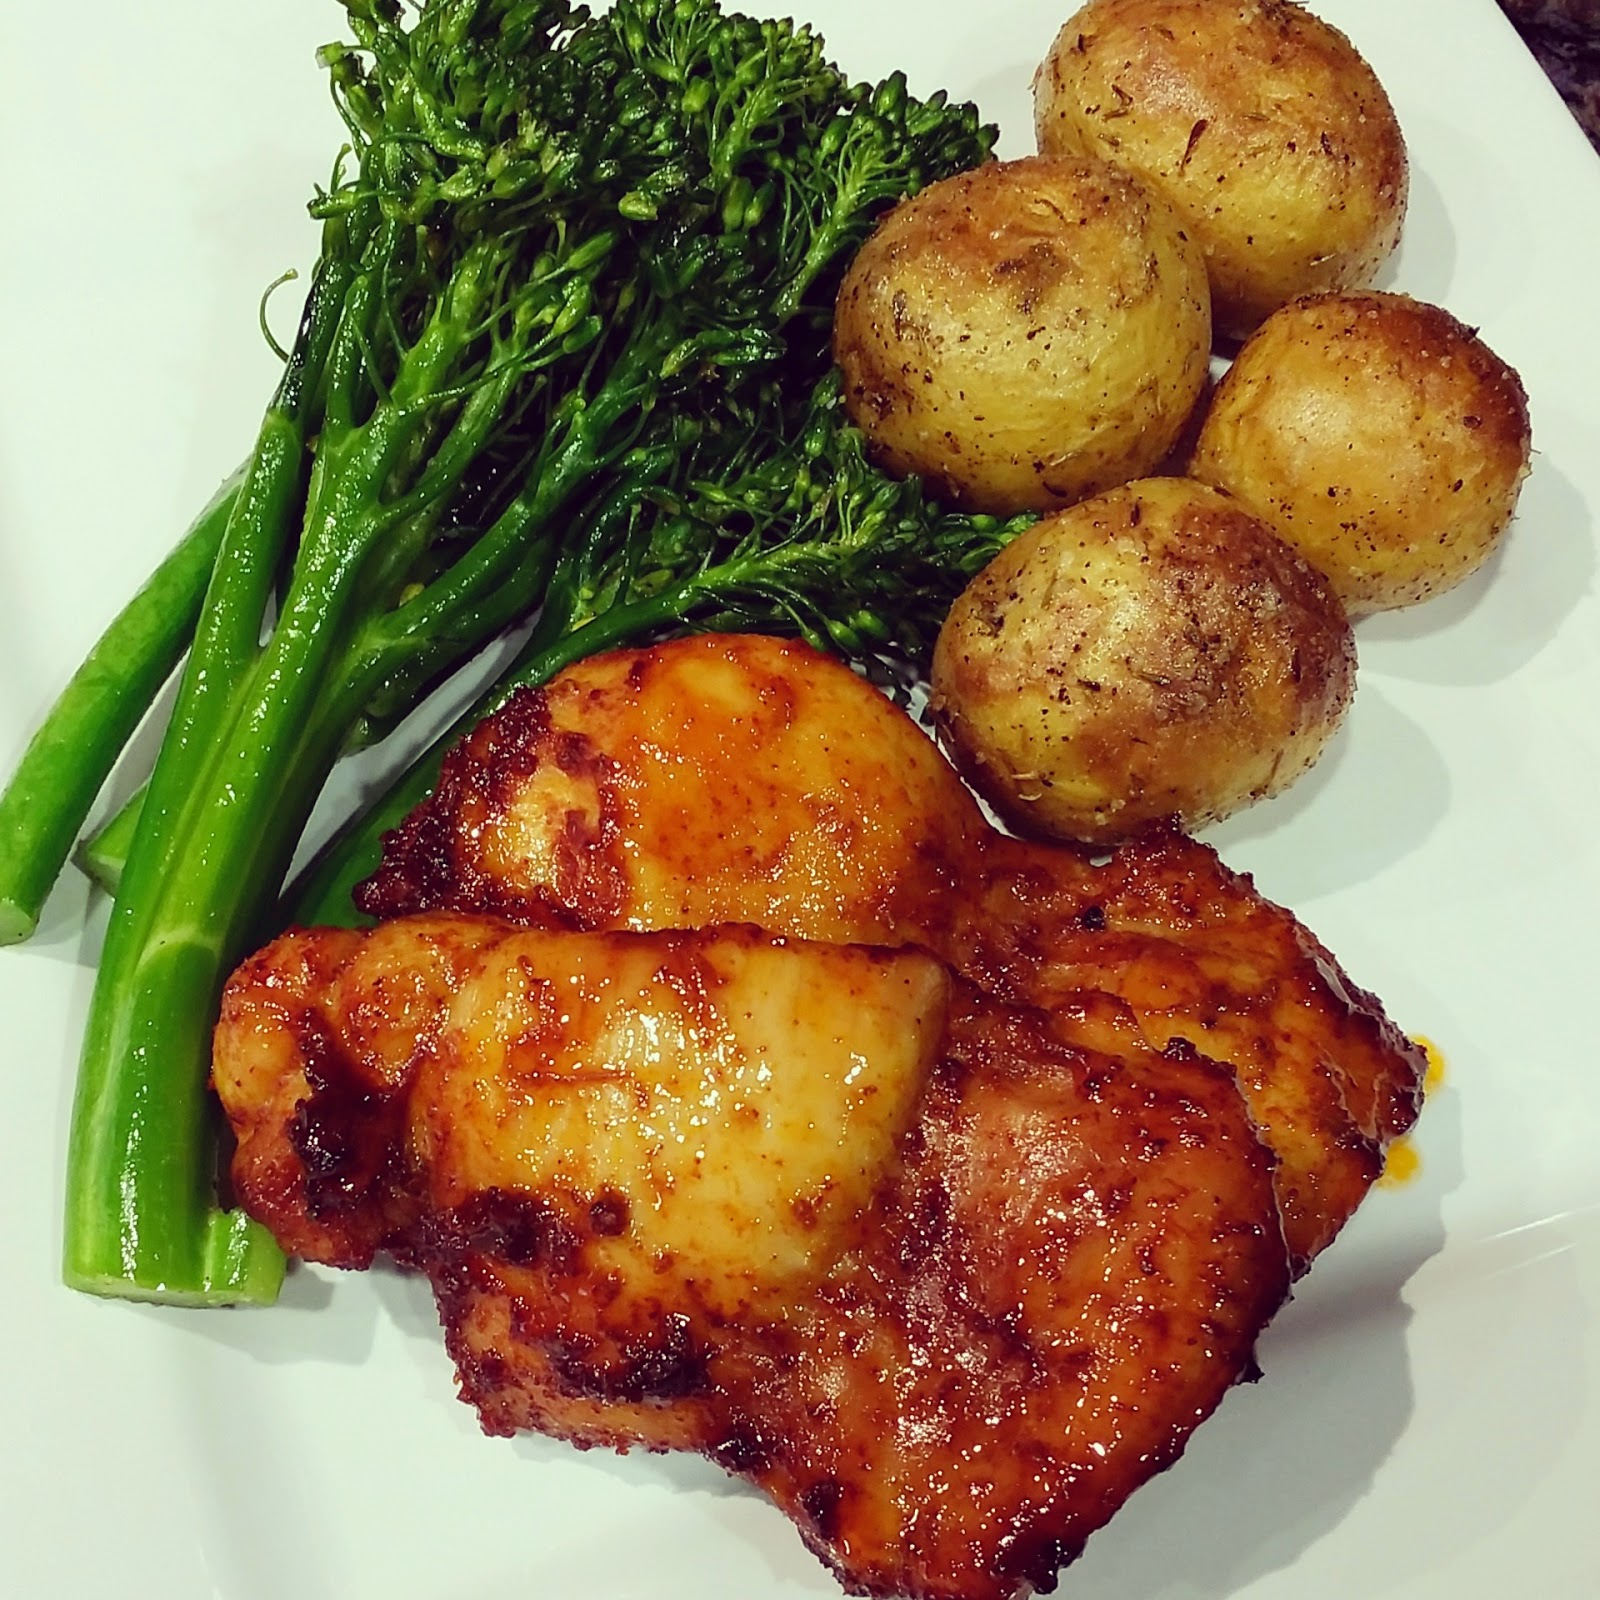 Spicy Honey Brushed Chicken Thighs Recipe — Dishmaps